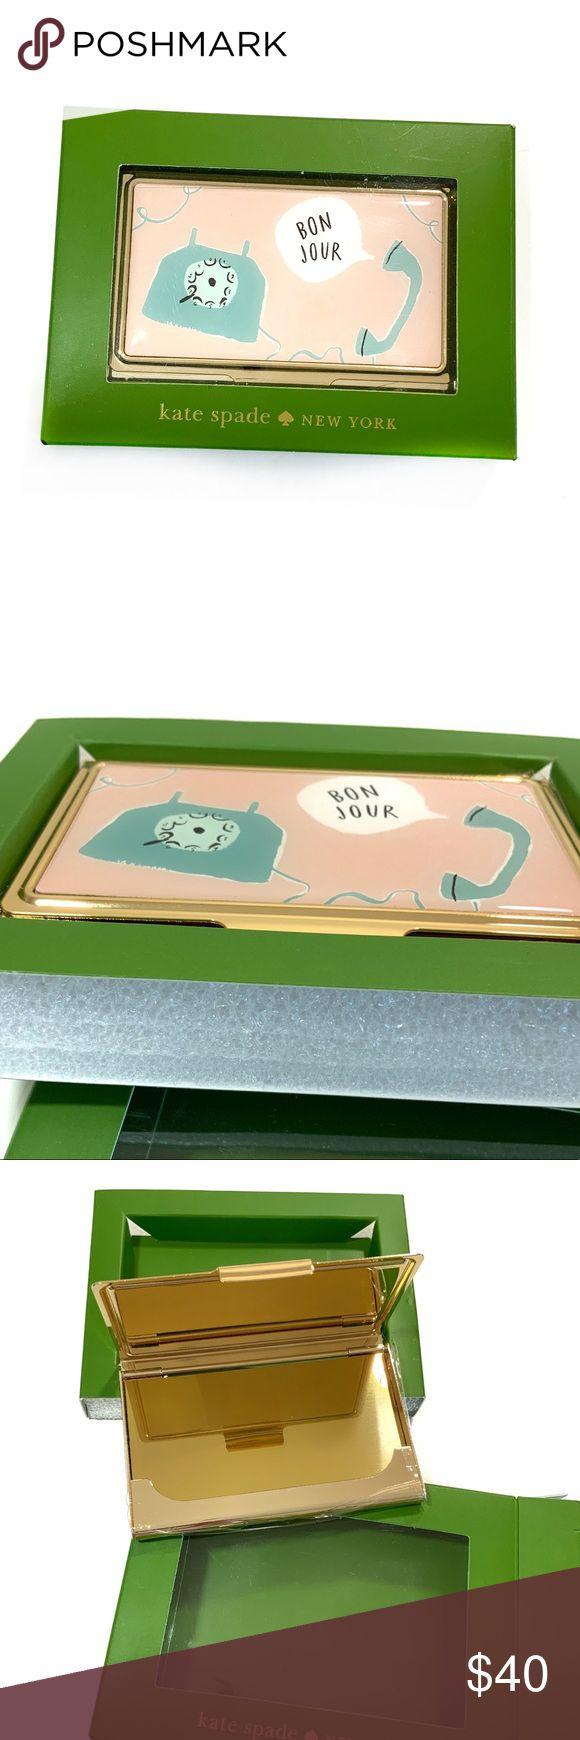 5🌟 kate spade lenox bon jour business card holder  kate